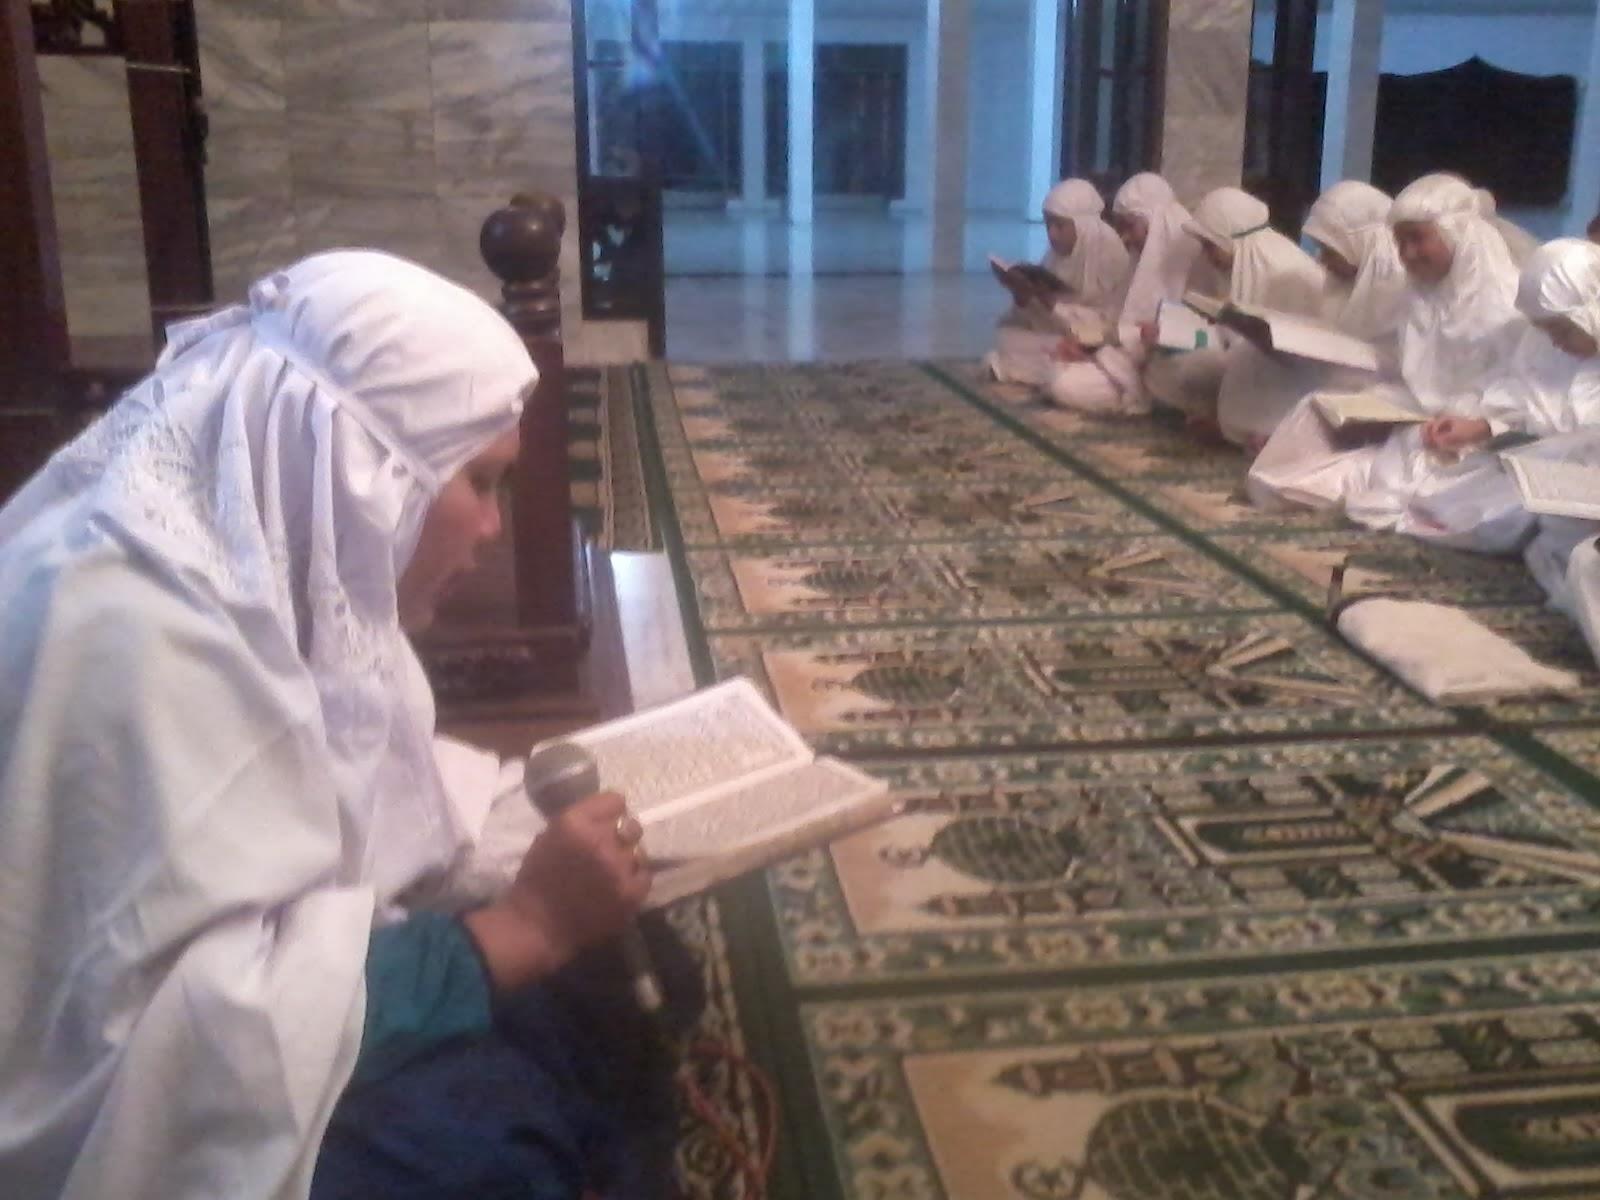 Peserta putri Malam Ibadah saat bertadarrus Al Qur an mengawali kegiatan malam Ibadah kegiatan ini langsung dibimbing langsung oleh Ibu Hj Kholilah Lubis